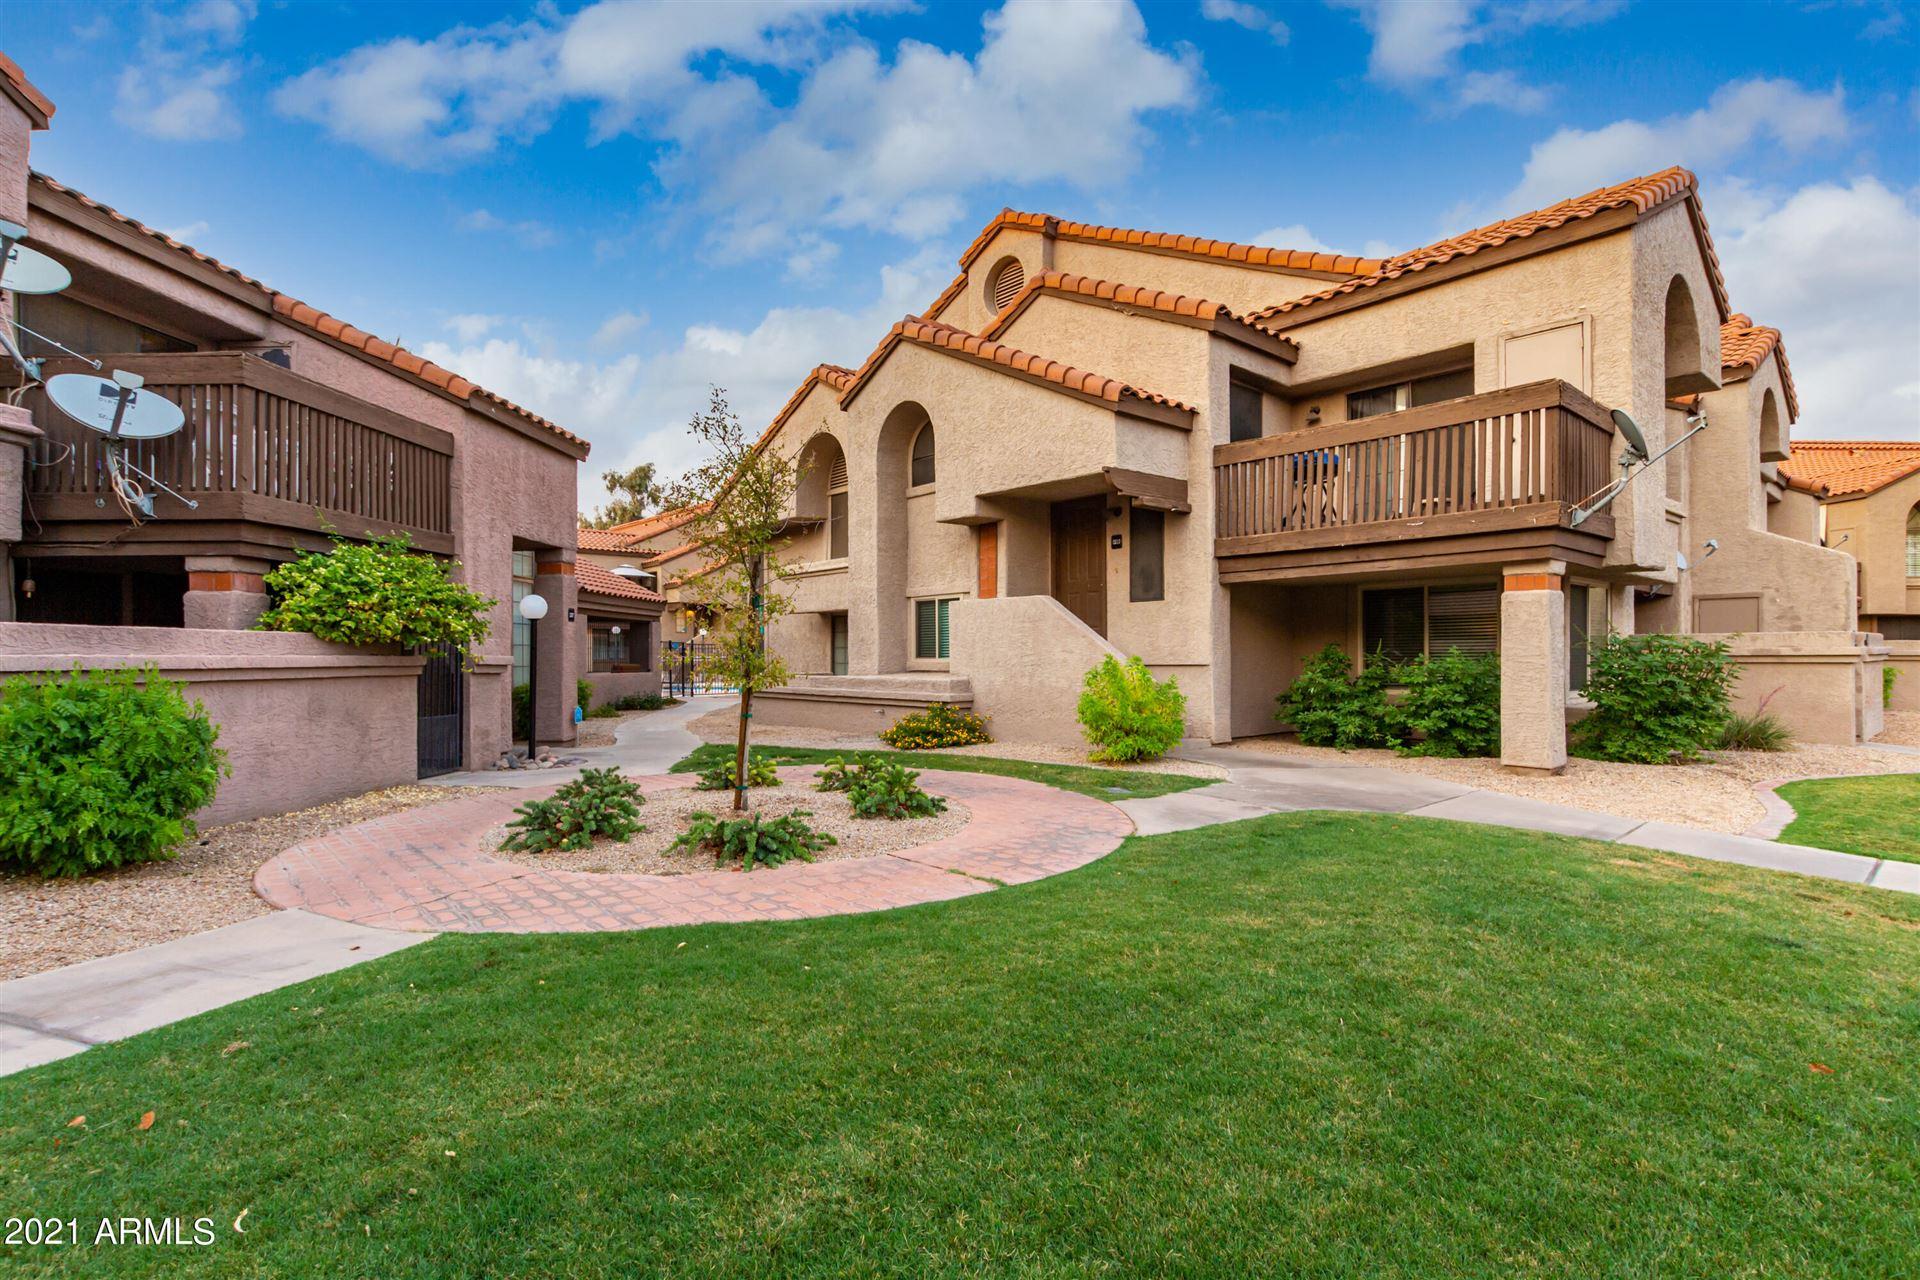 700 E Mesquite Circle #O210, Tempe, AZ 85281 - MLS#: 6252145